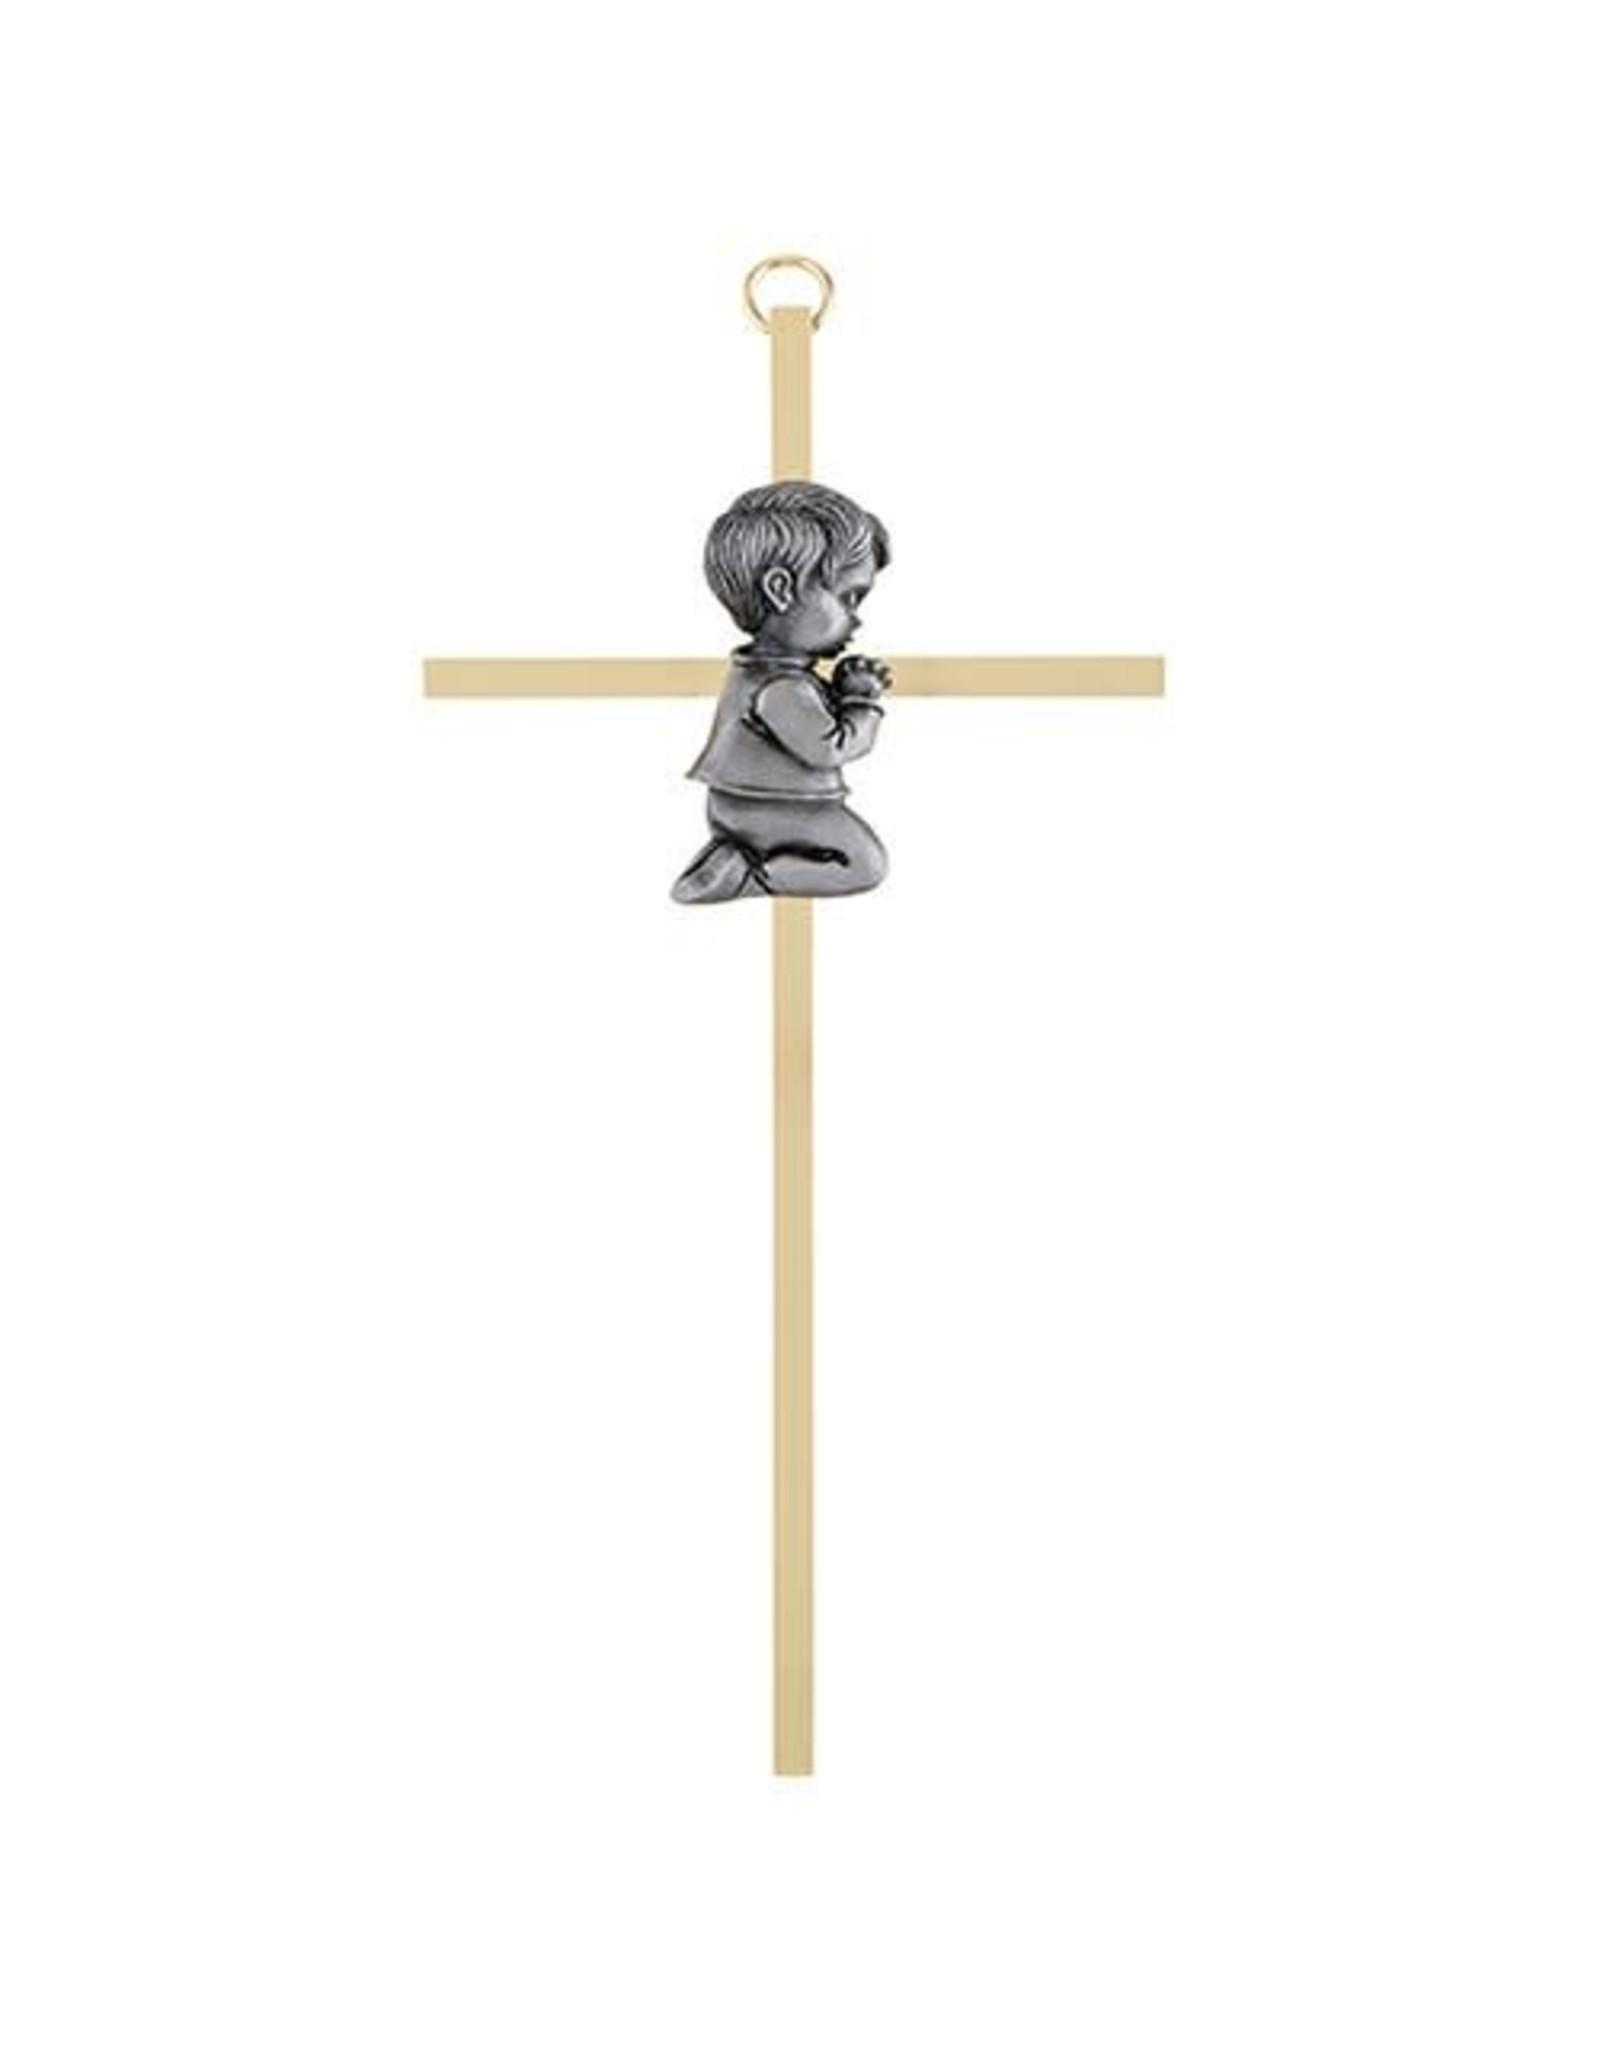 Christian Brands Brass Cross with Emblem - Baby Boy